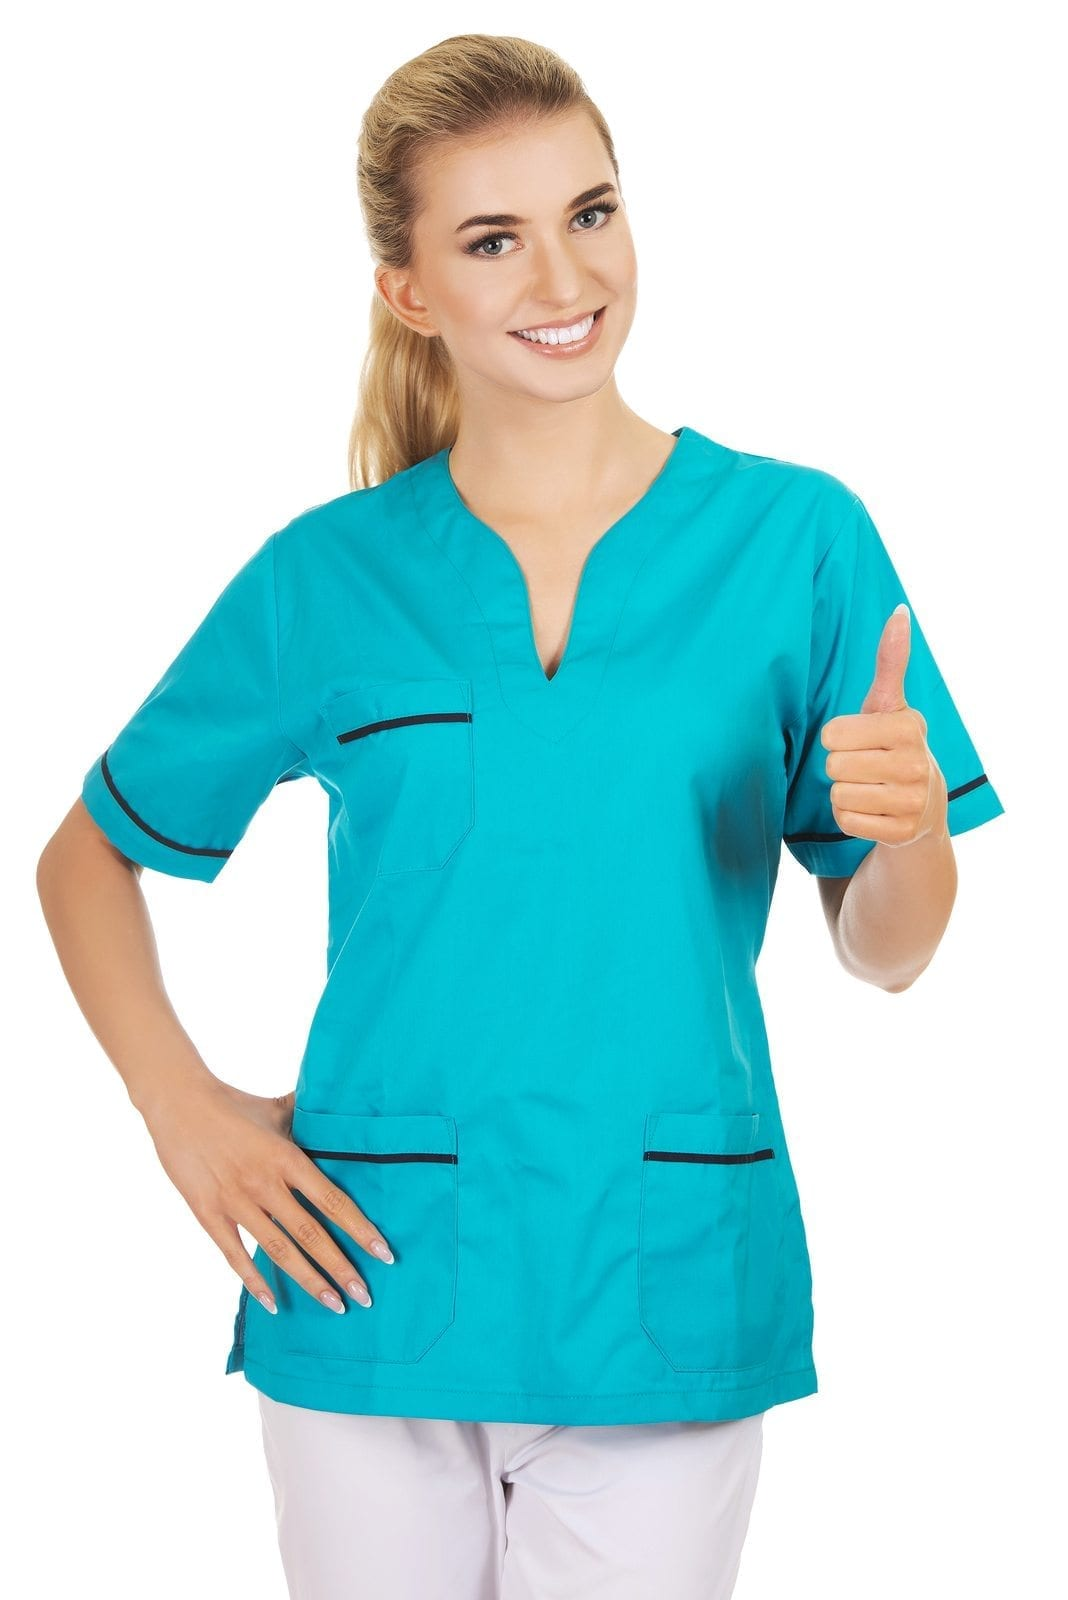 courseworks columbia nursing